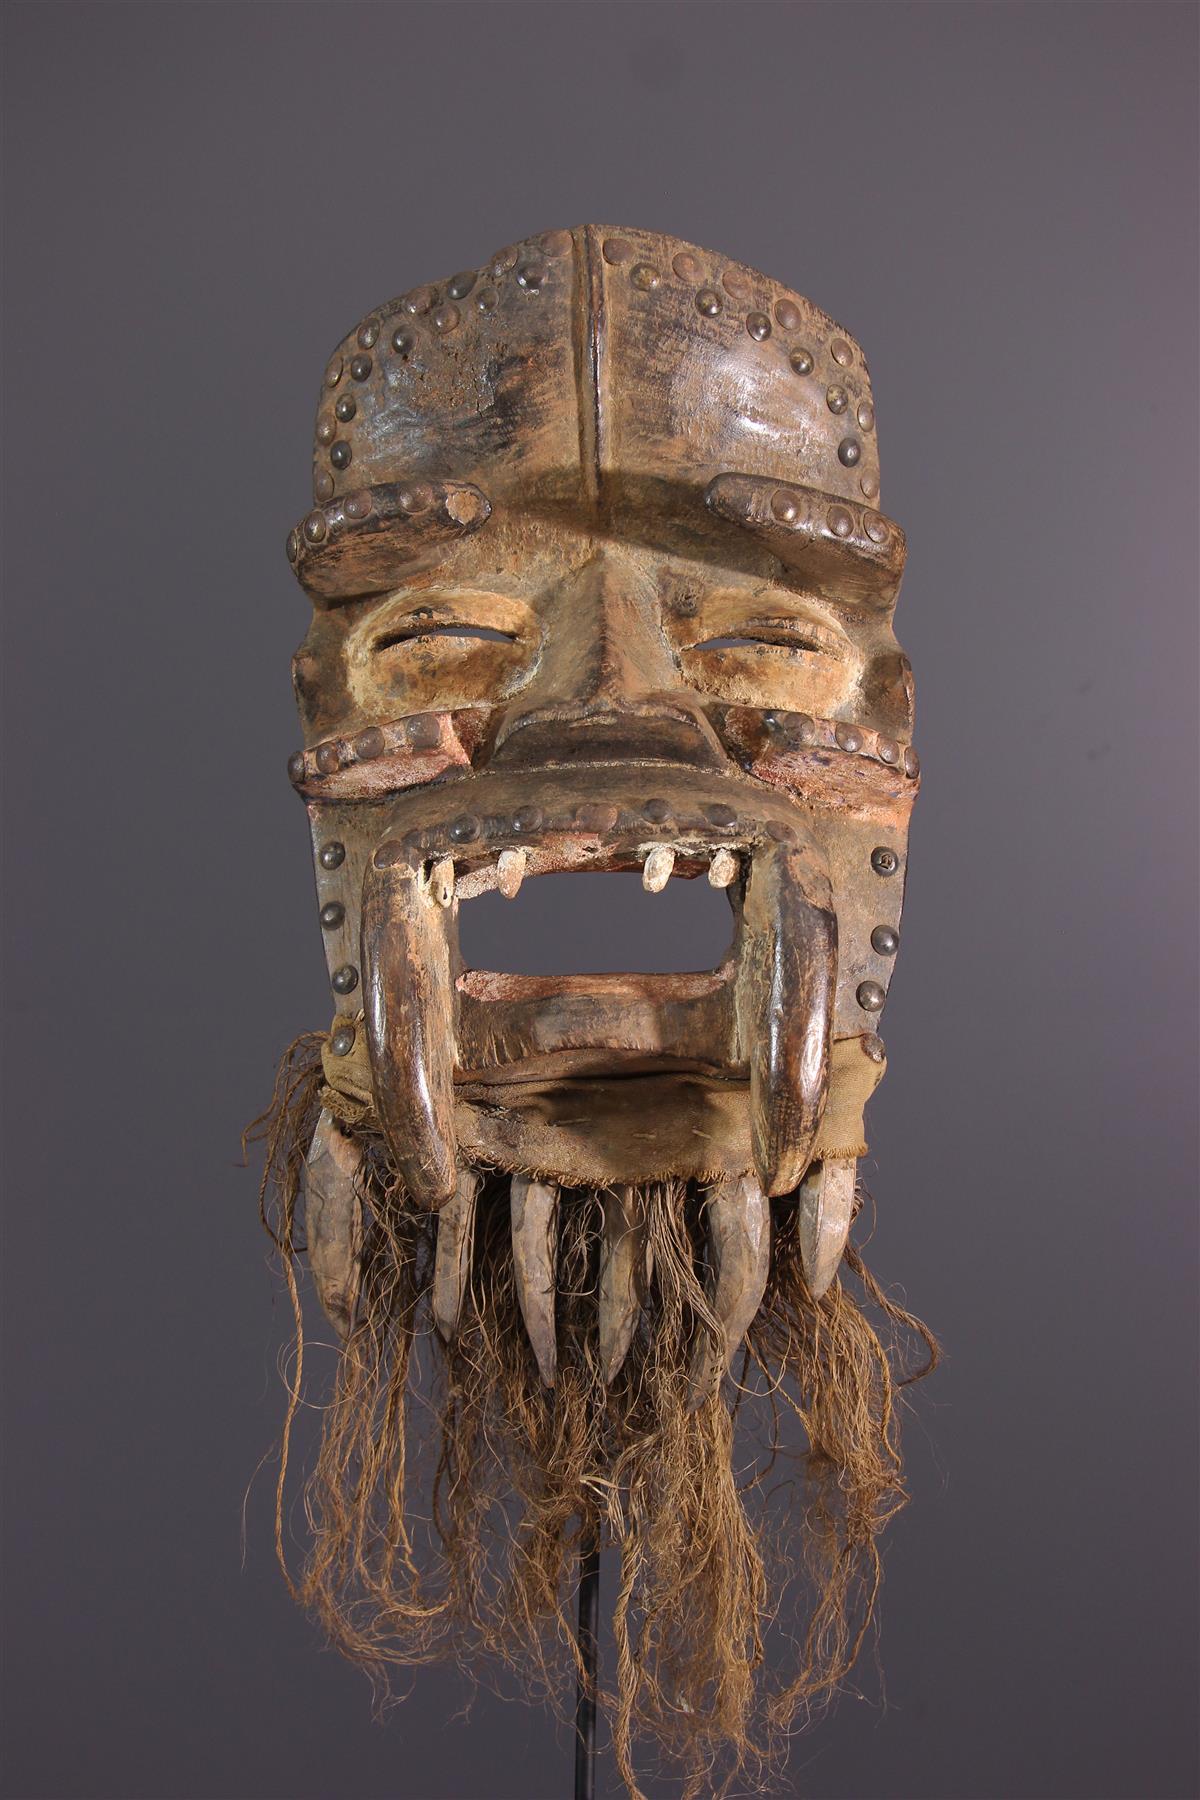 Beté Mask - Tribal art